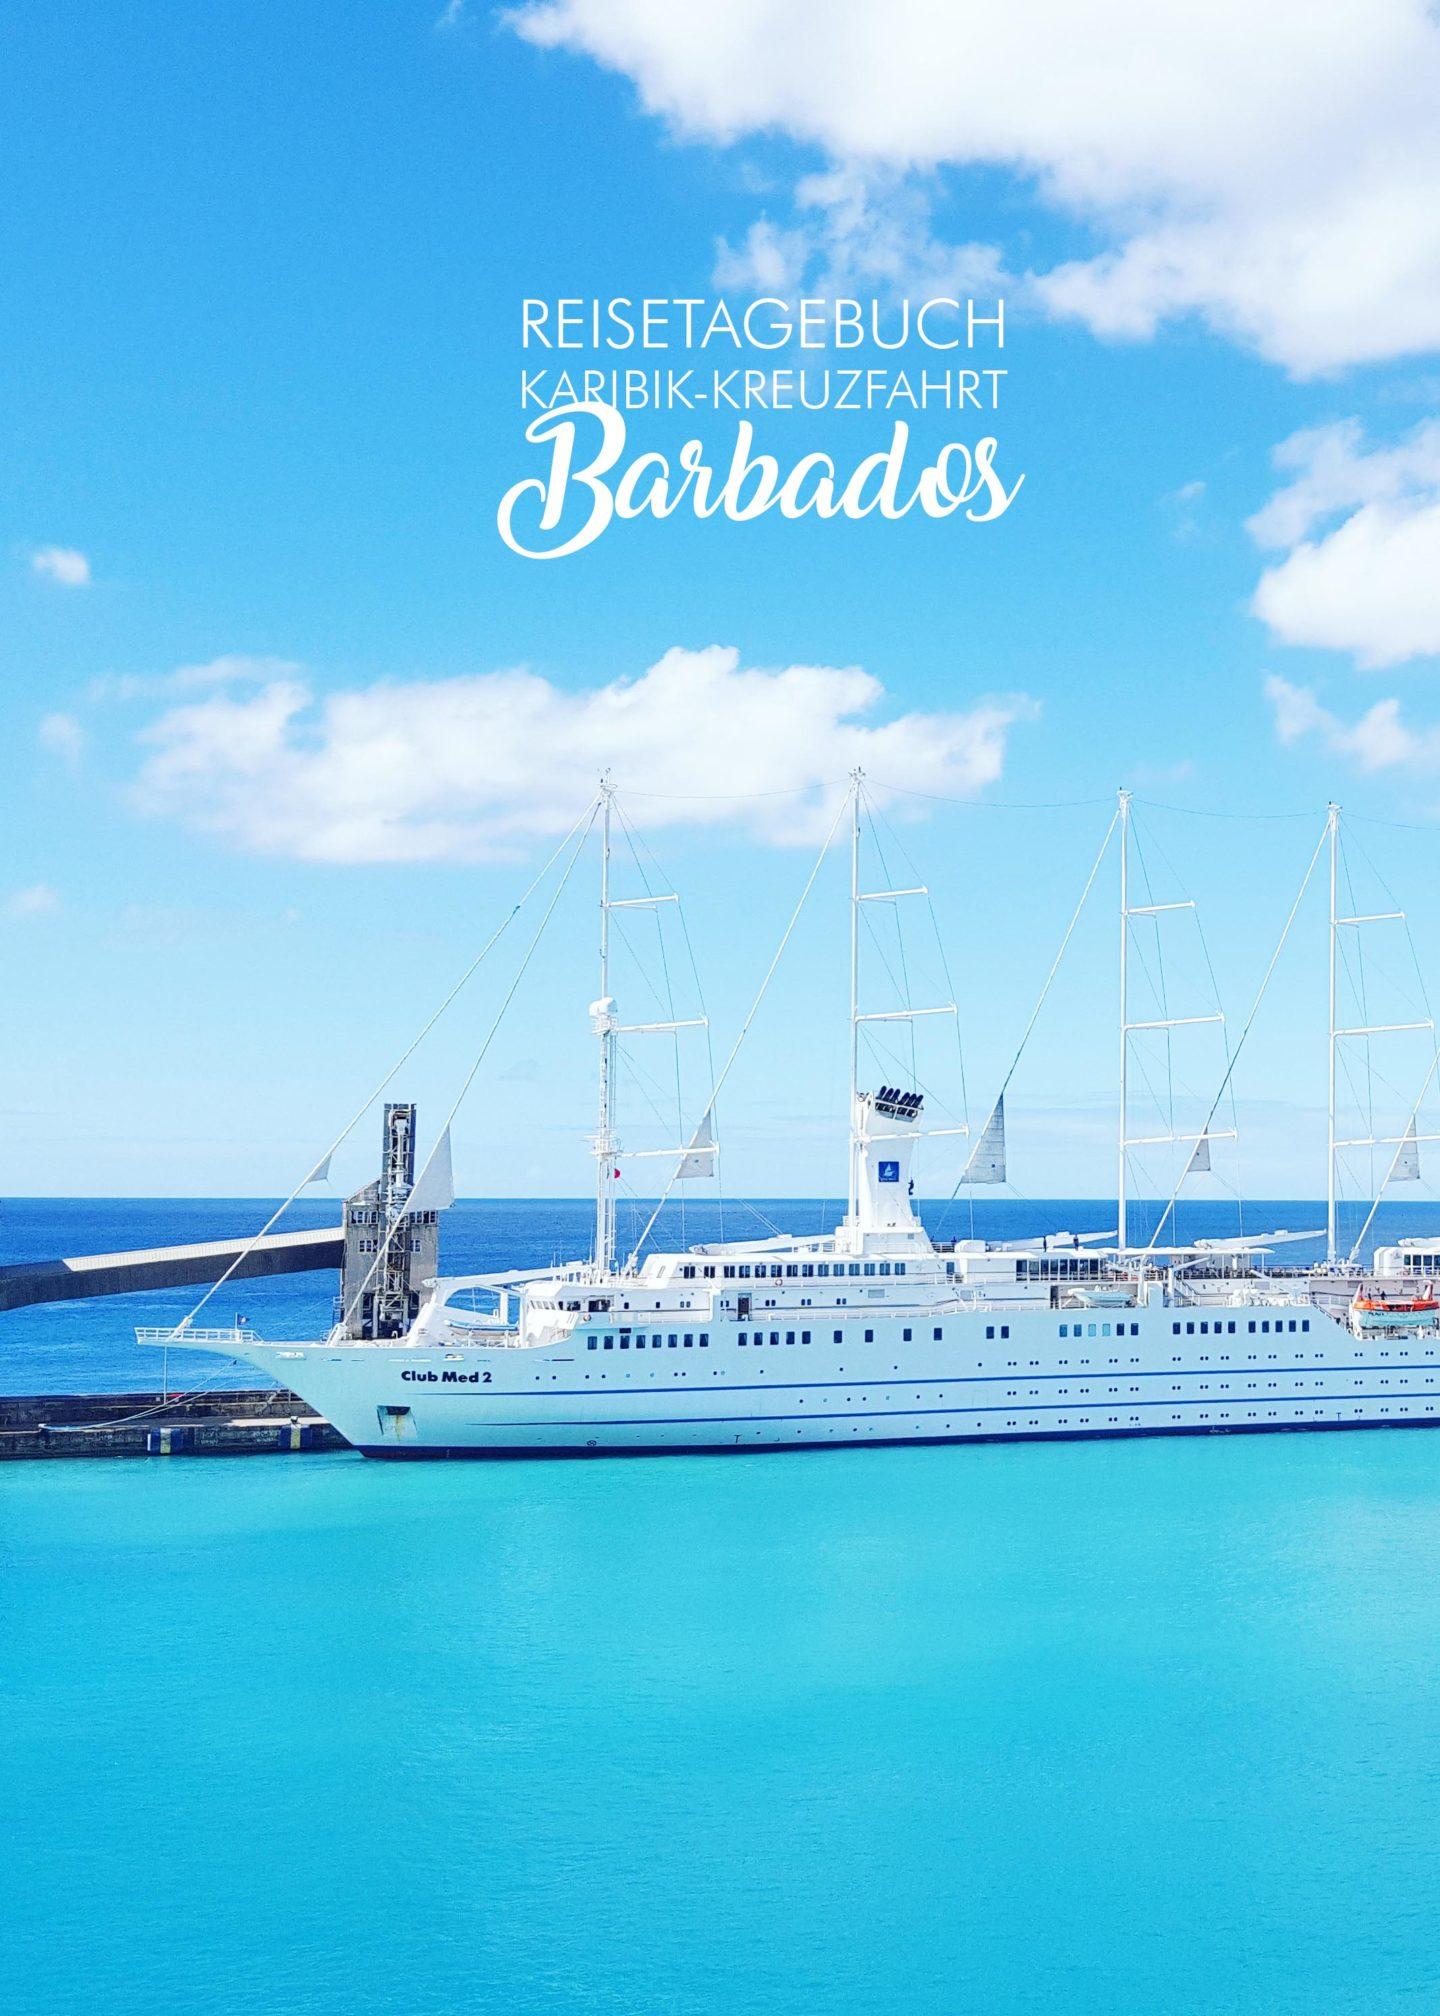 Karibik Kreuzfahrt Barbados Reisetagebuch